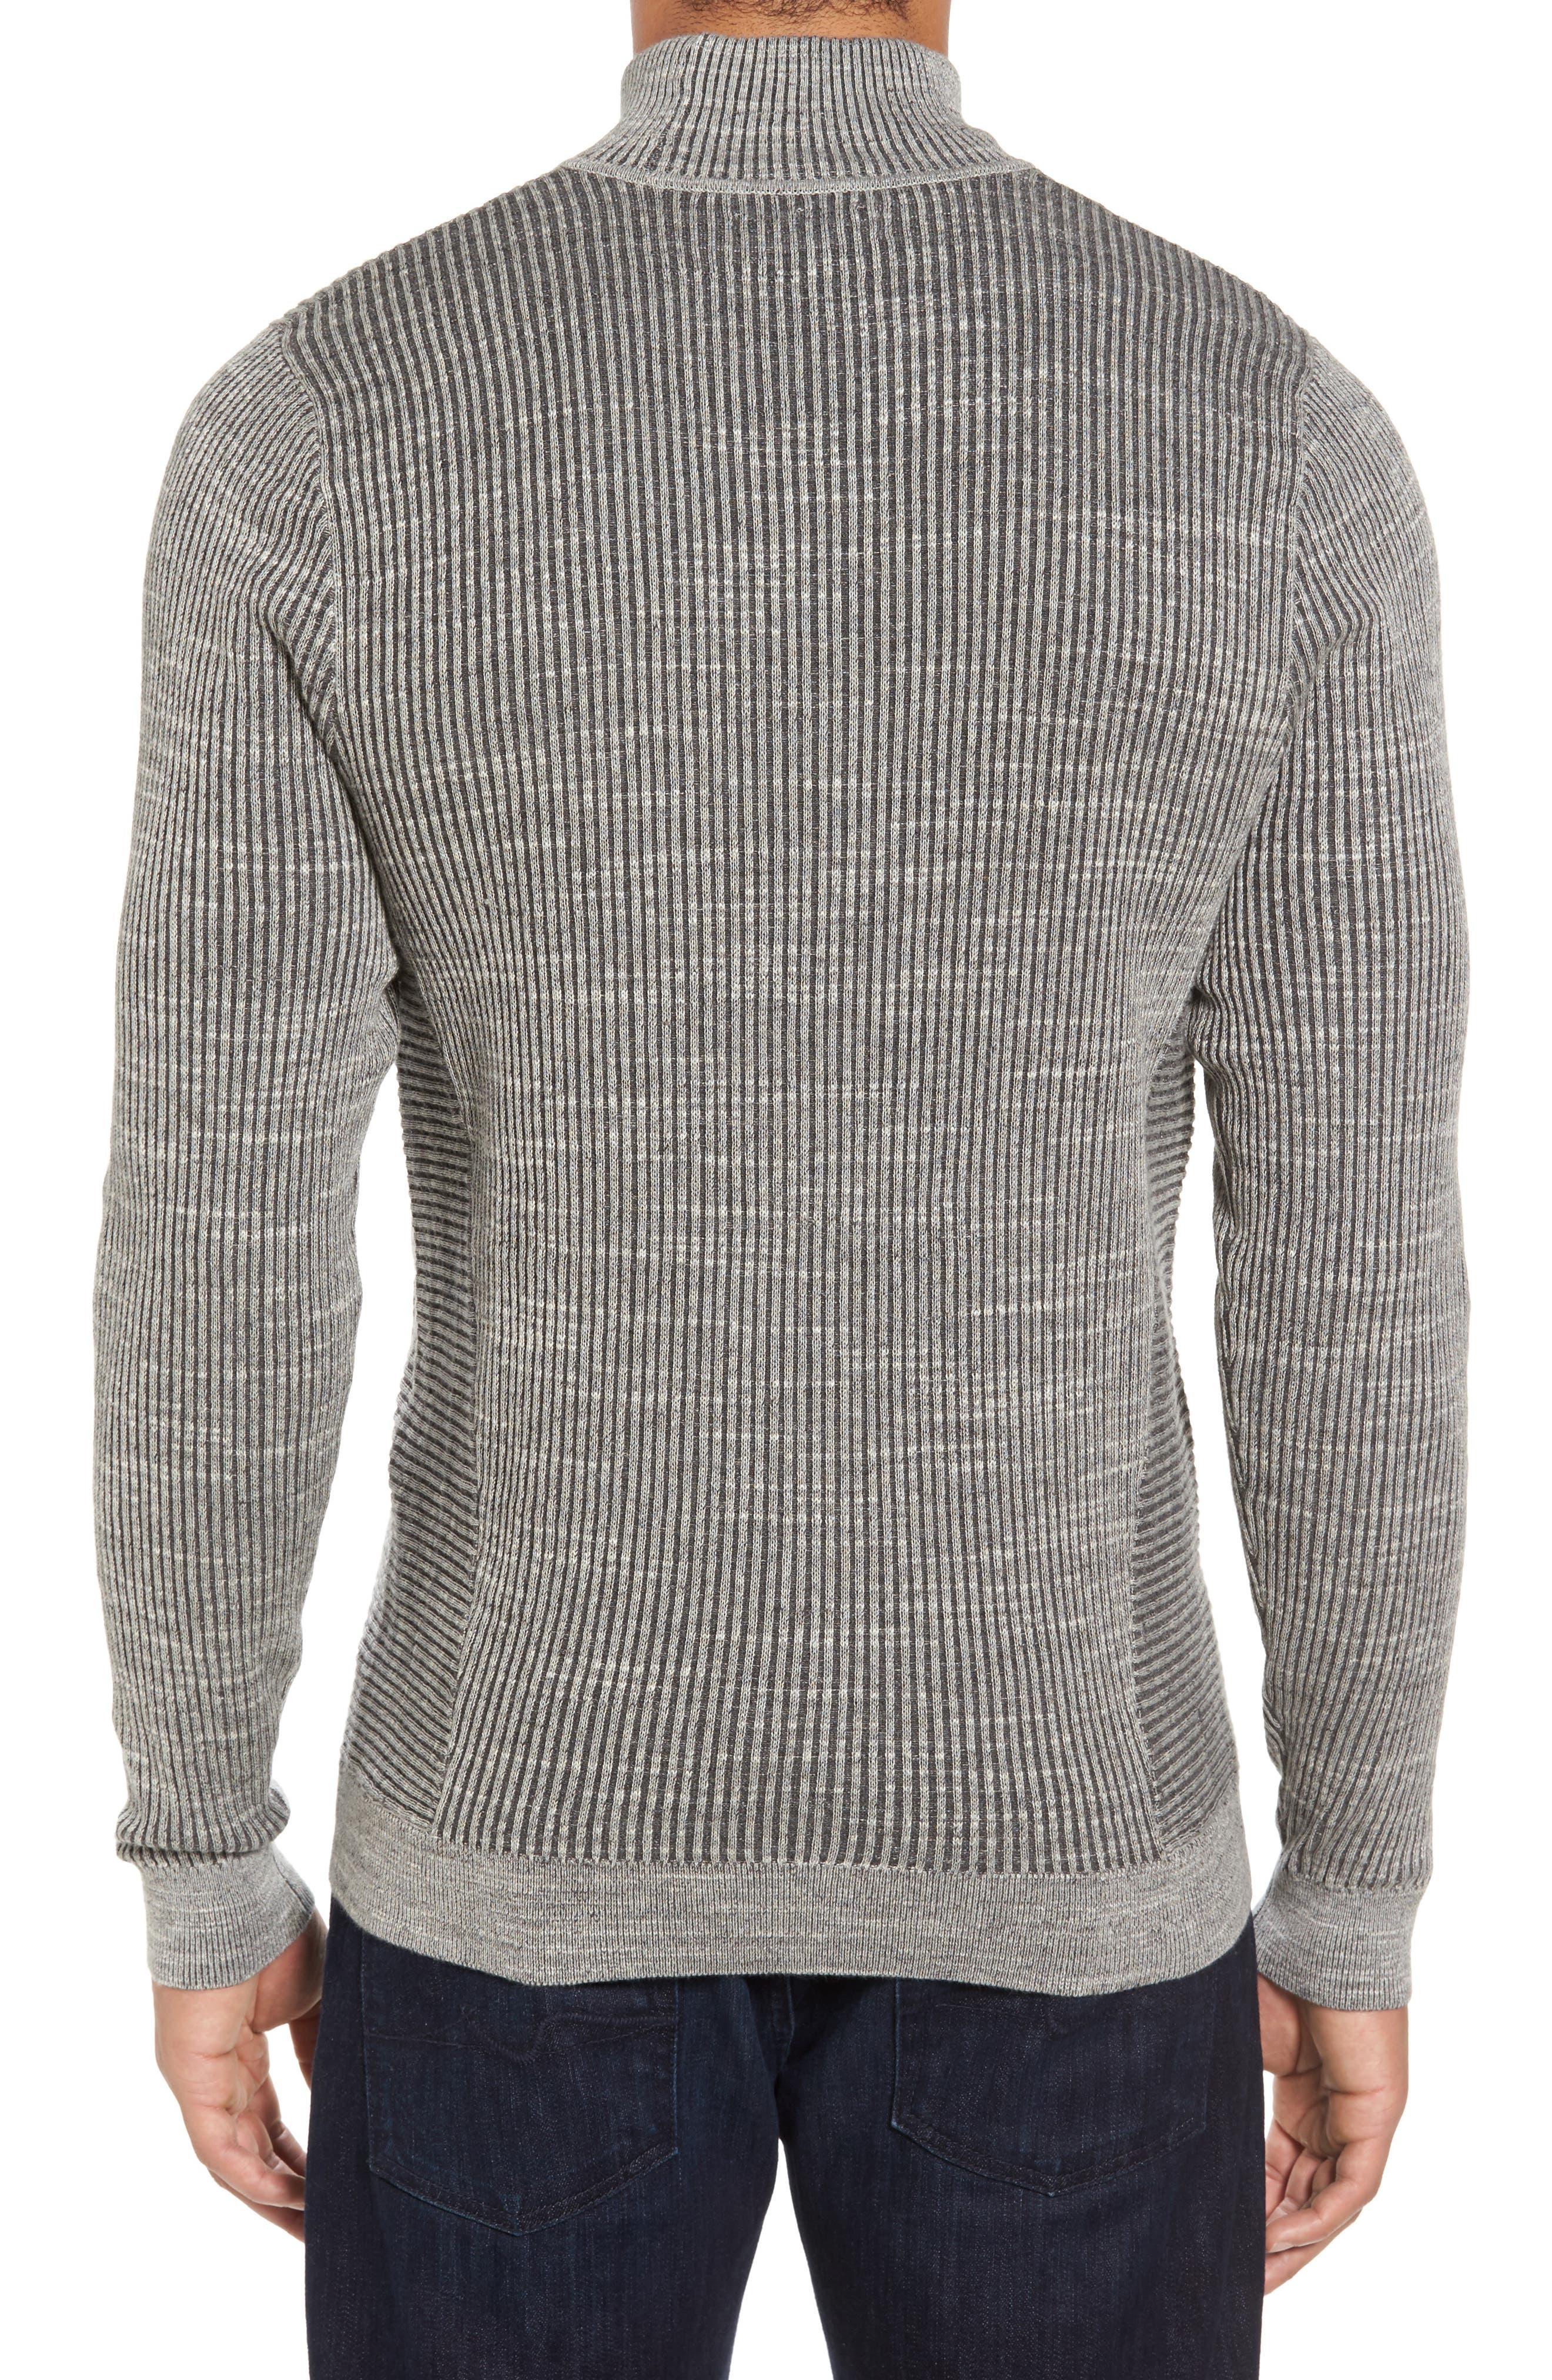 Mock Neck Sweater,                             Alternate thumbnail 2, color,                             Grey Dark Charcoal